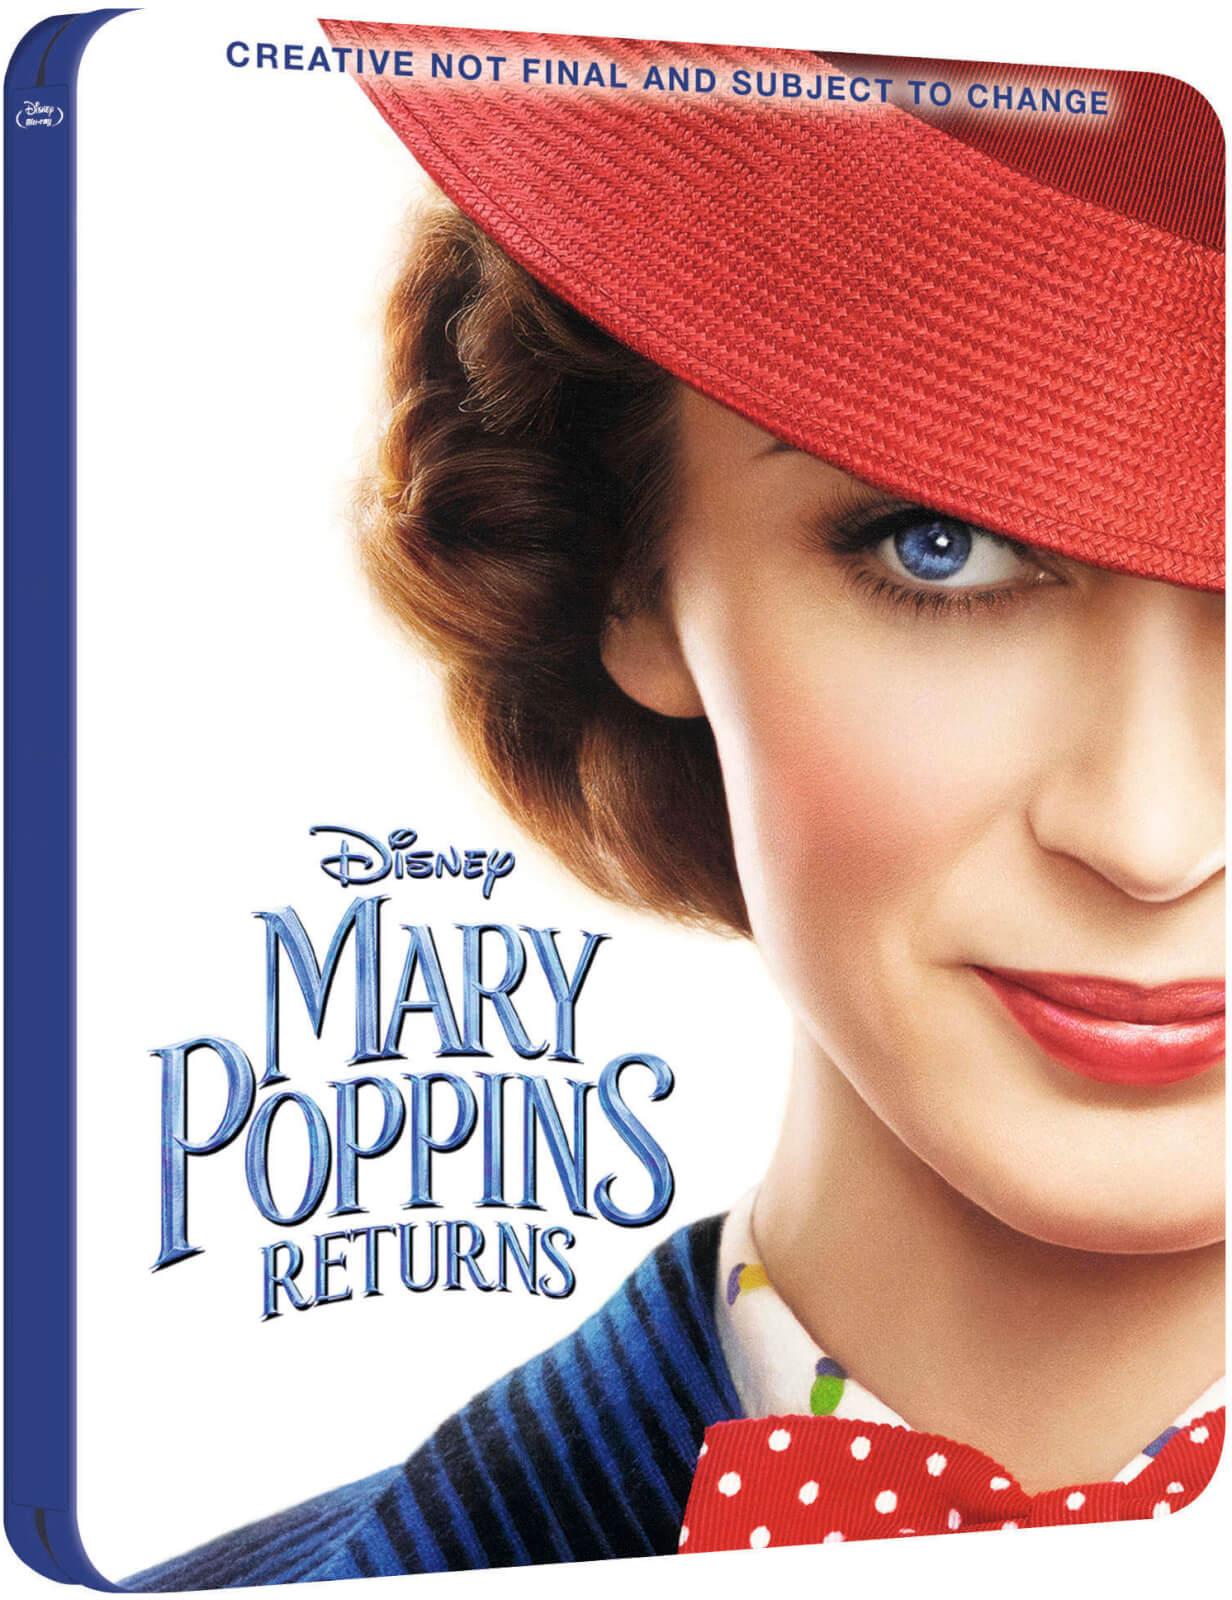 Mary Poppins Returns SteelBook UK temp art